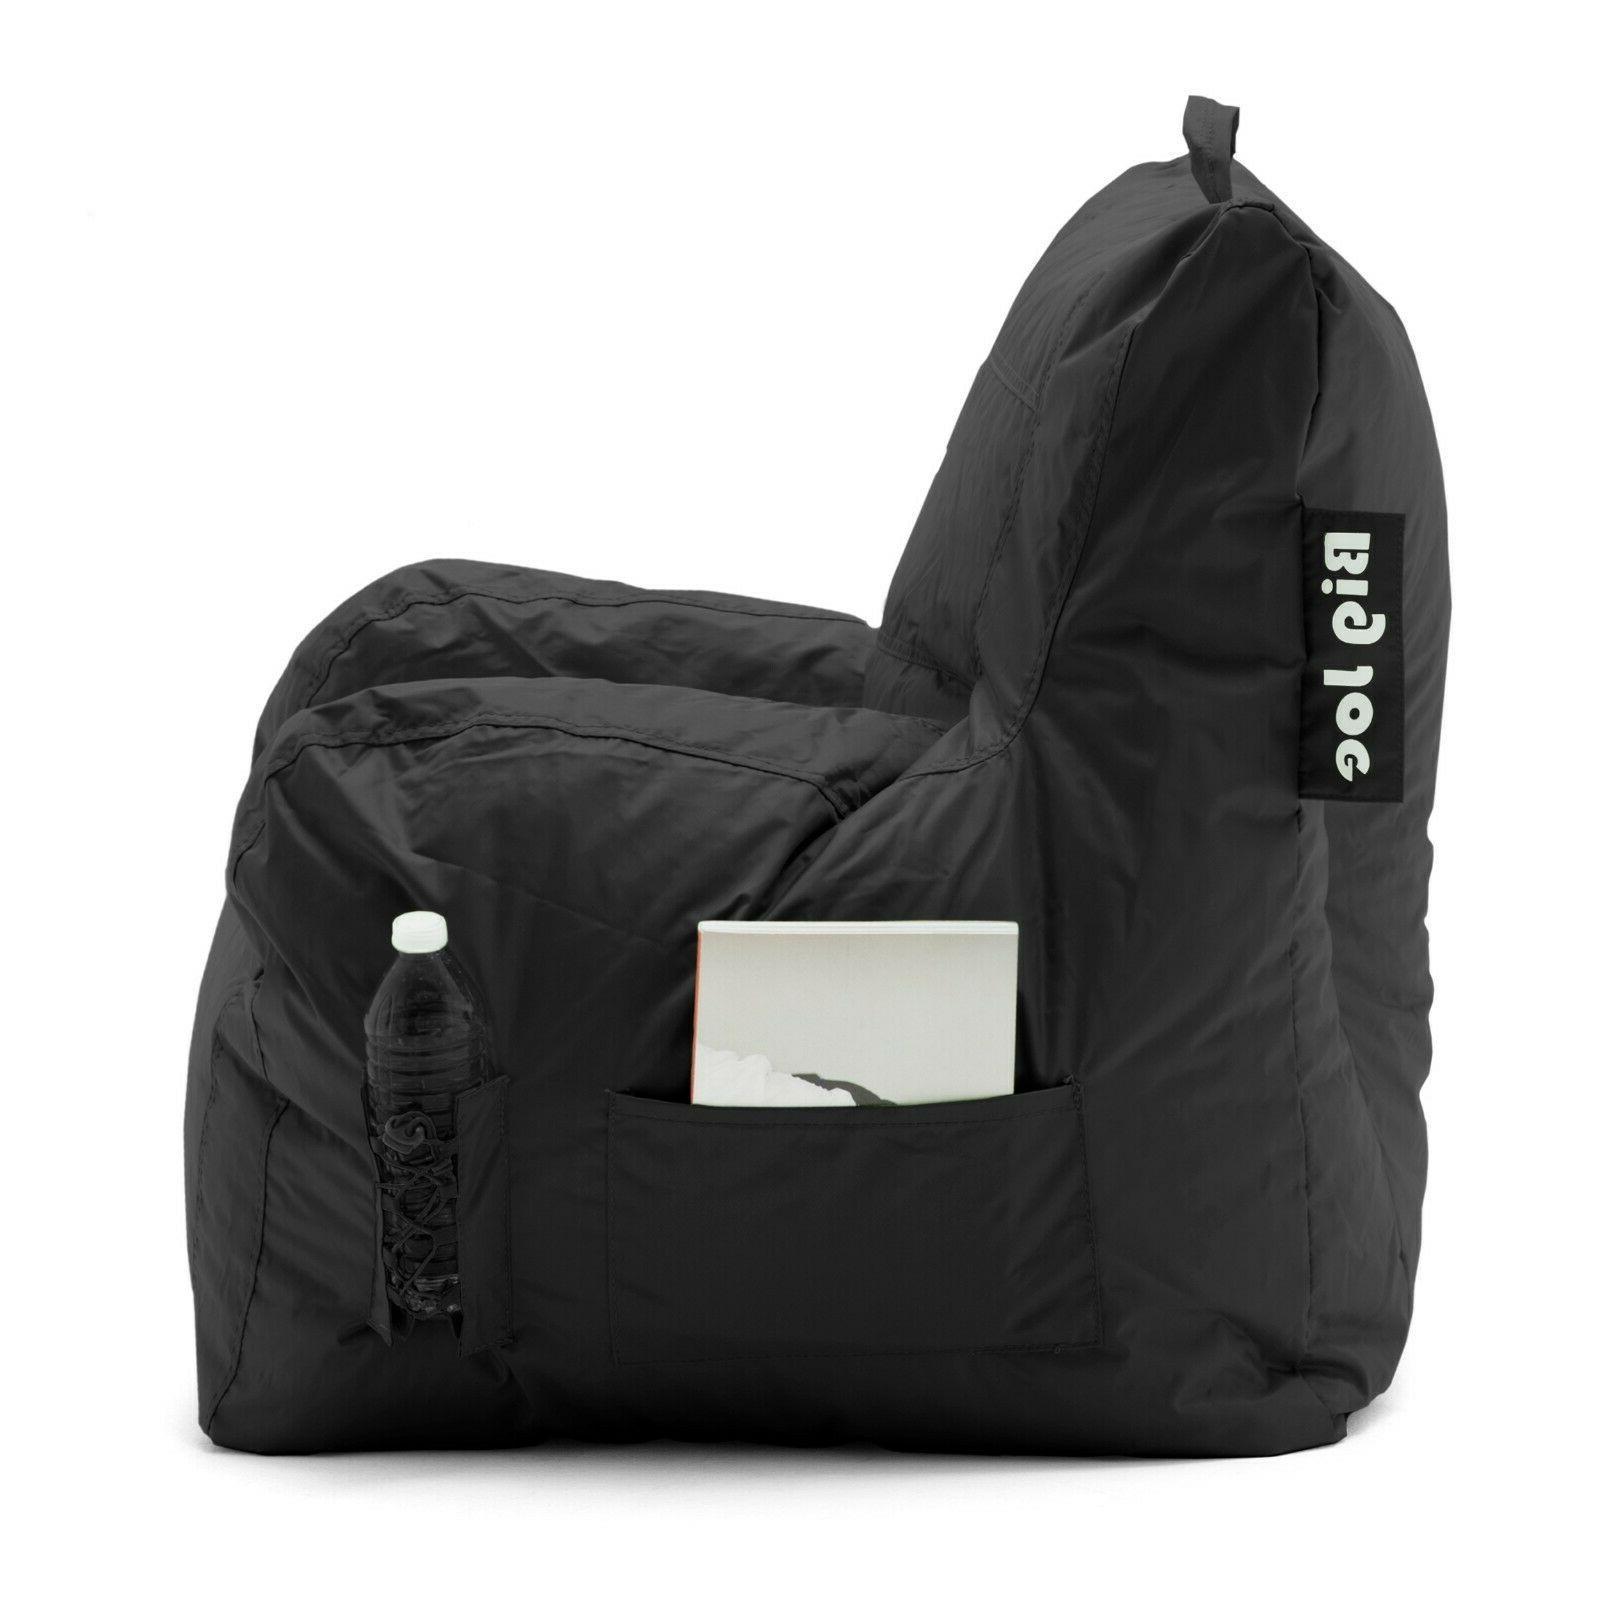 XL Joe Bean Bag Kids & Adult